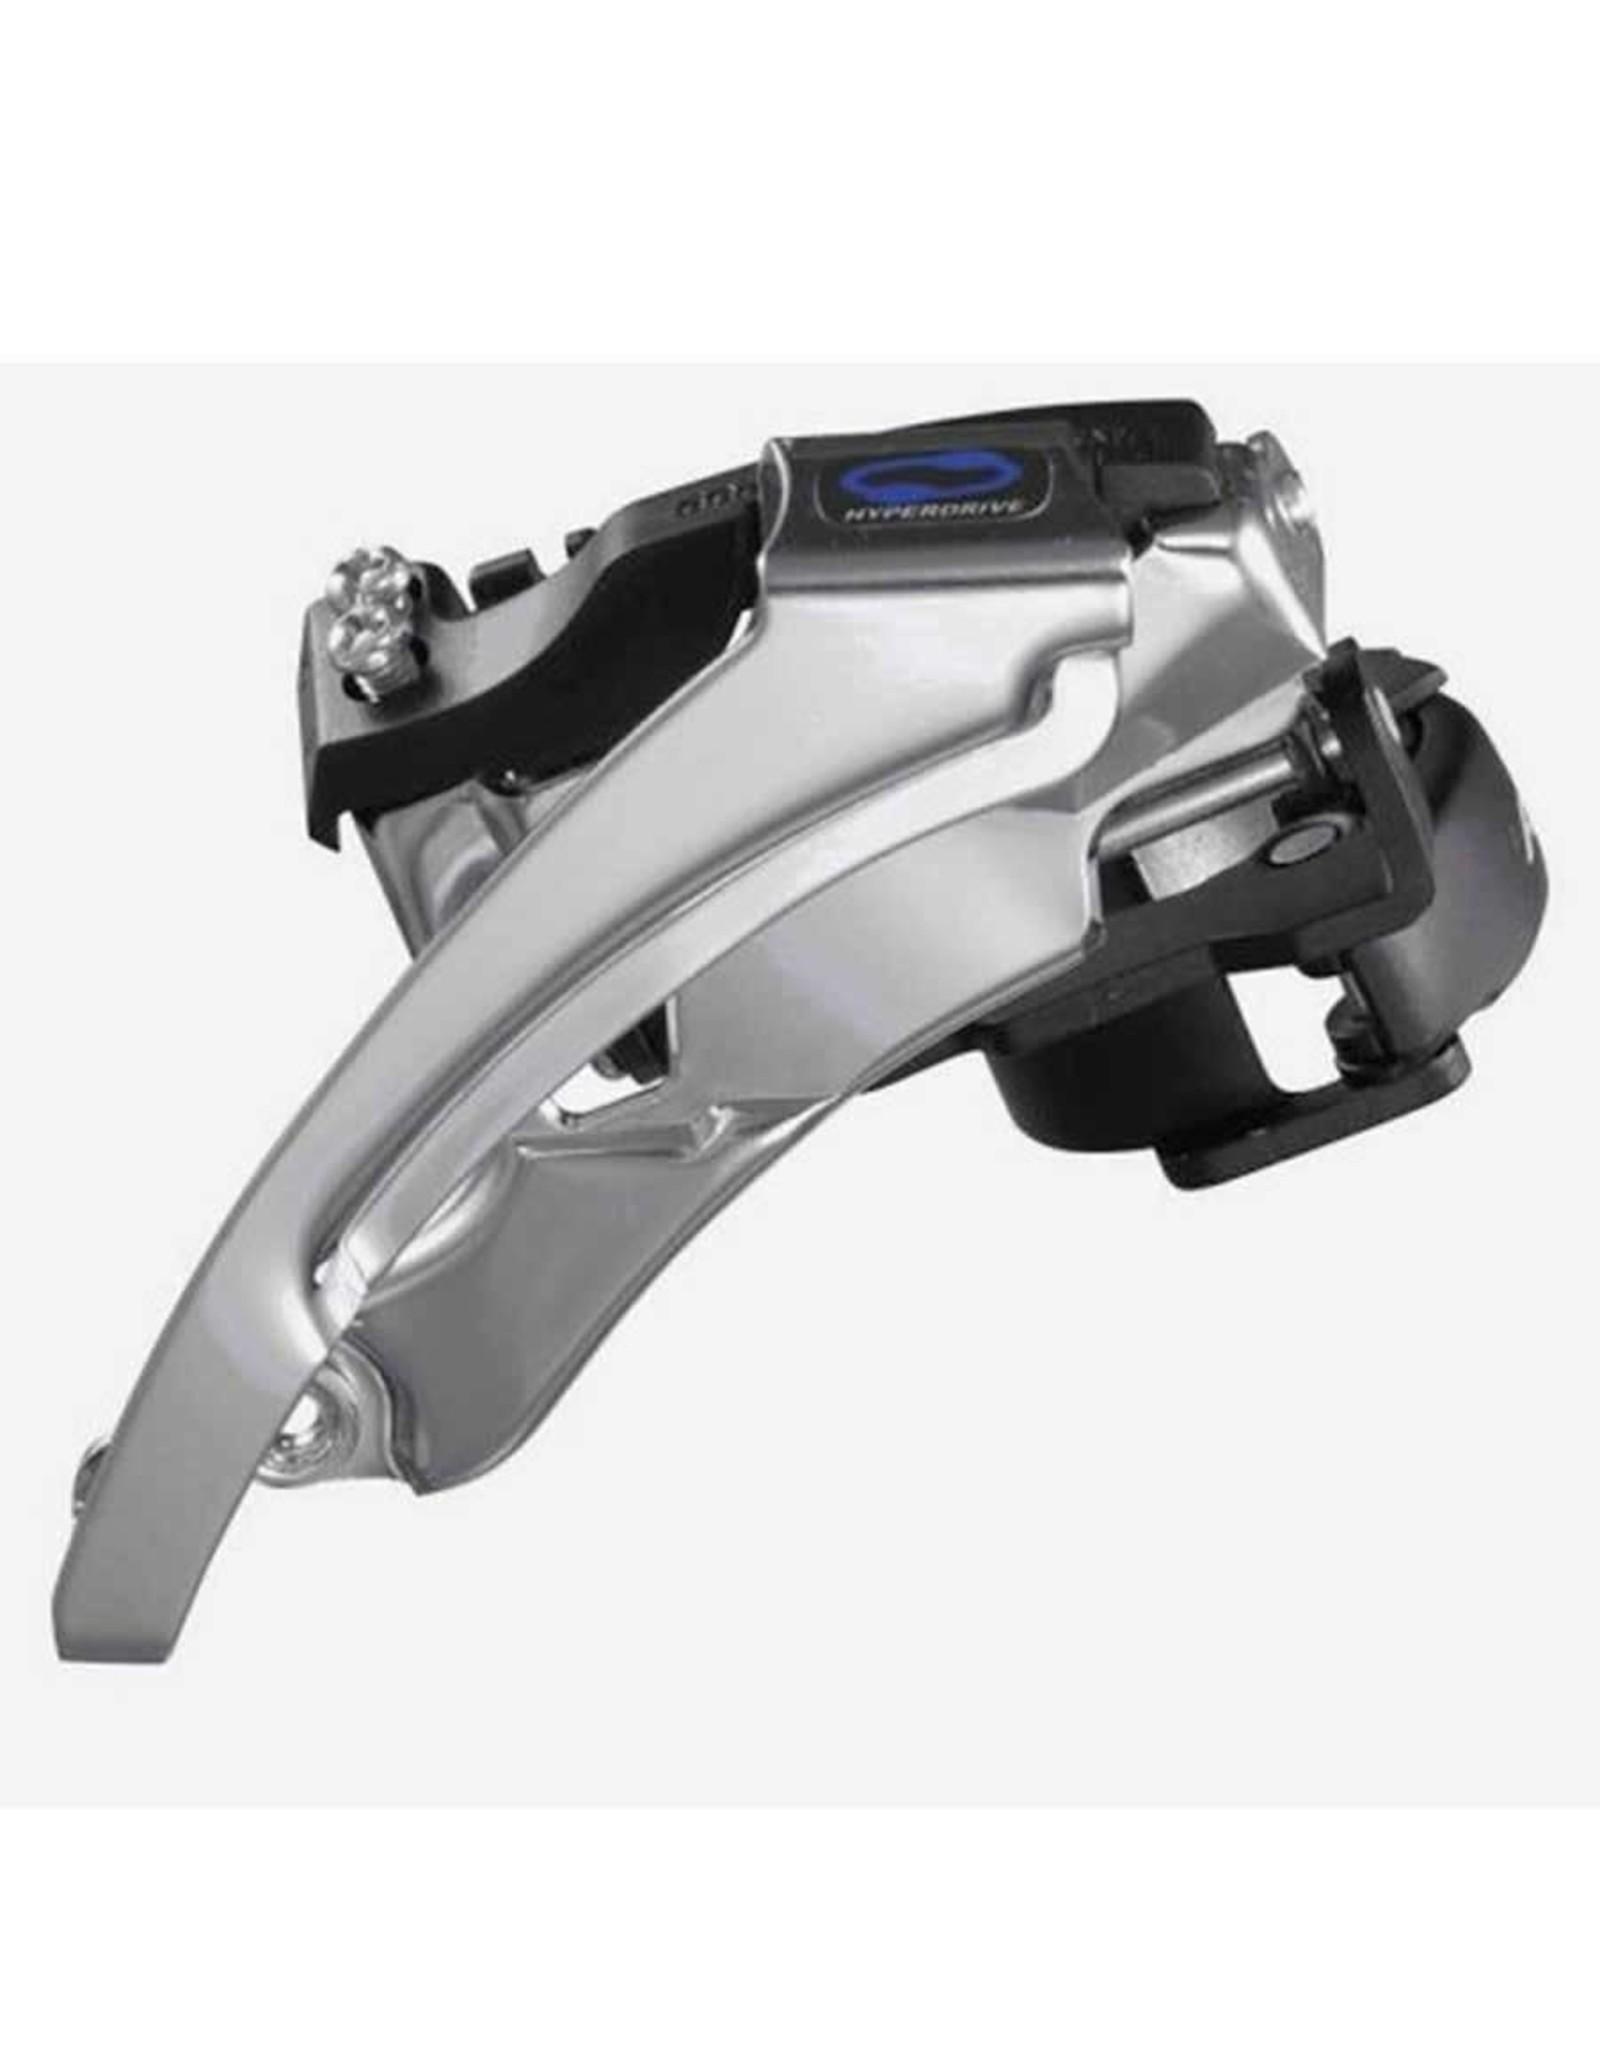 Shimano Derailleur, Front - Shimano Altus FD M310, 3x, 42/48T, Multi-Clamp, Top Swing, Dual Pull